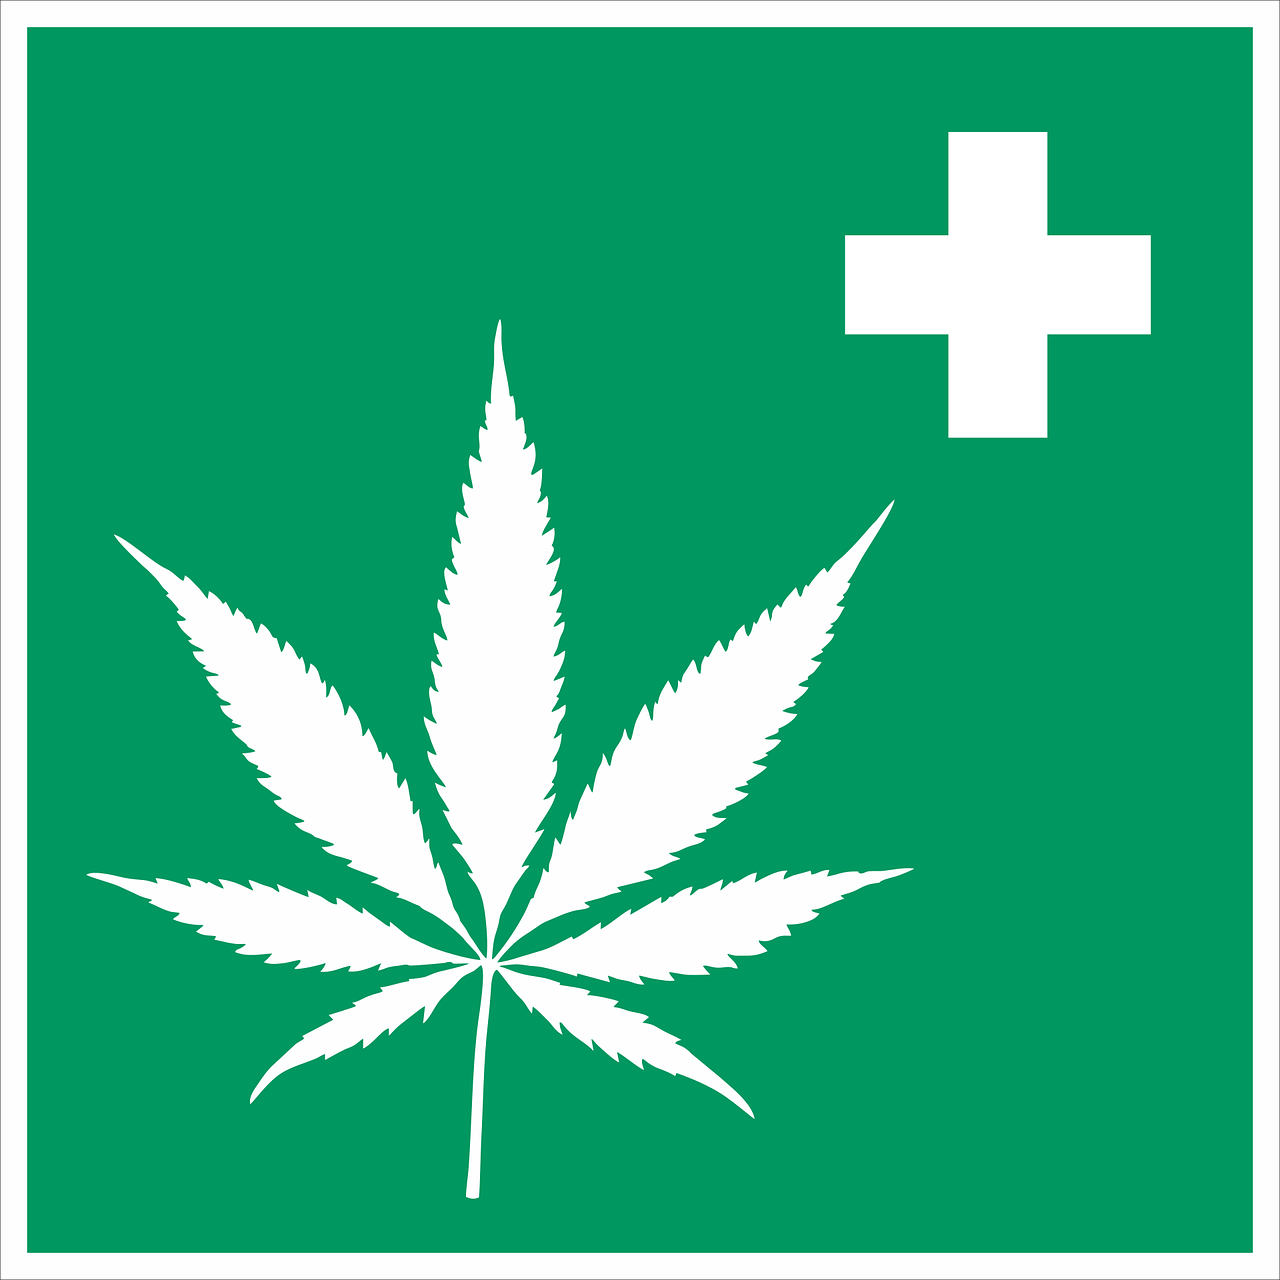 Cannabis,hemp,intoxicant,hemp leaf,medicine - free image from needpix.com